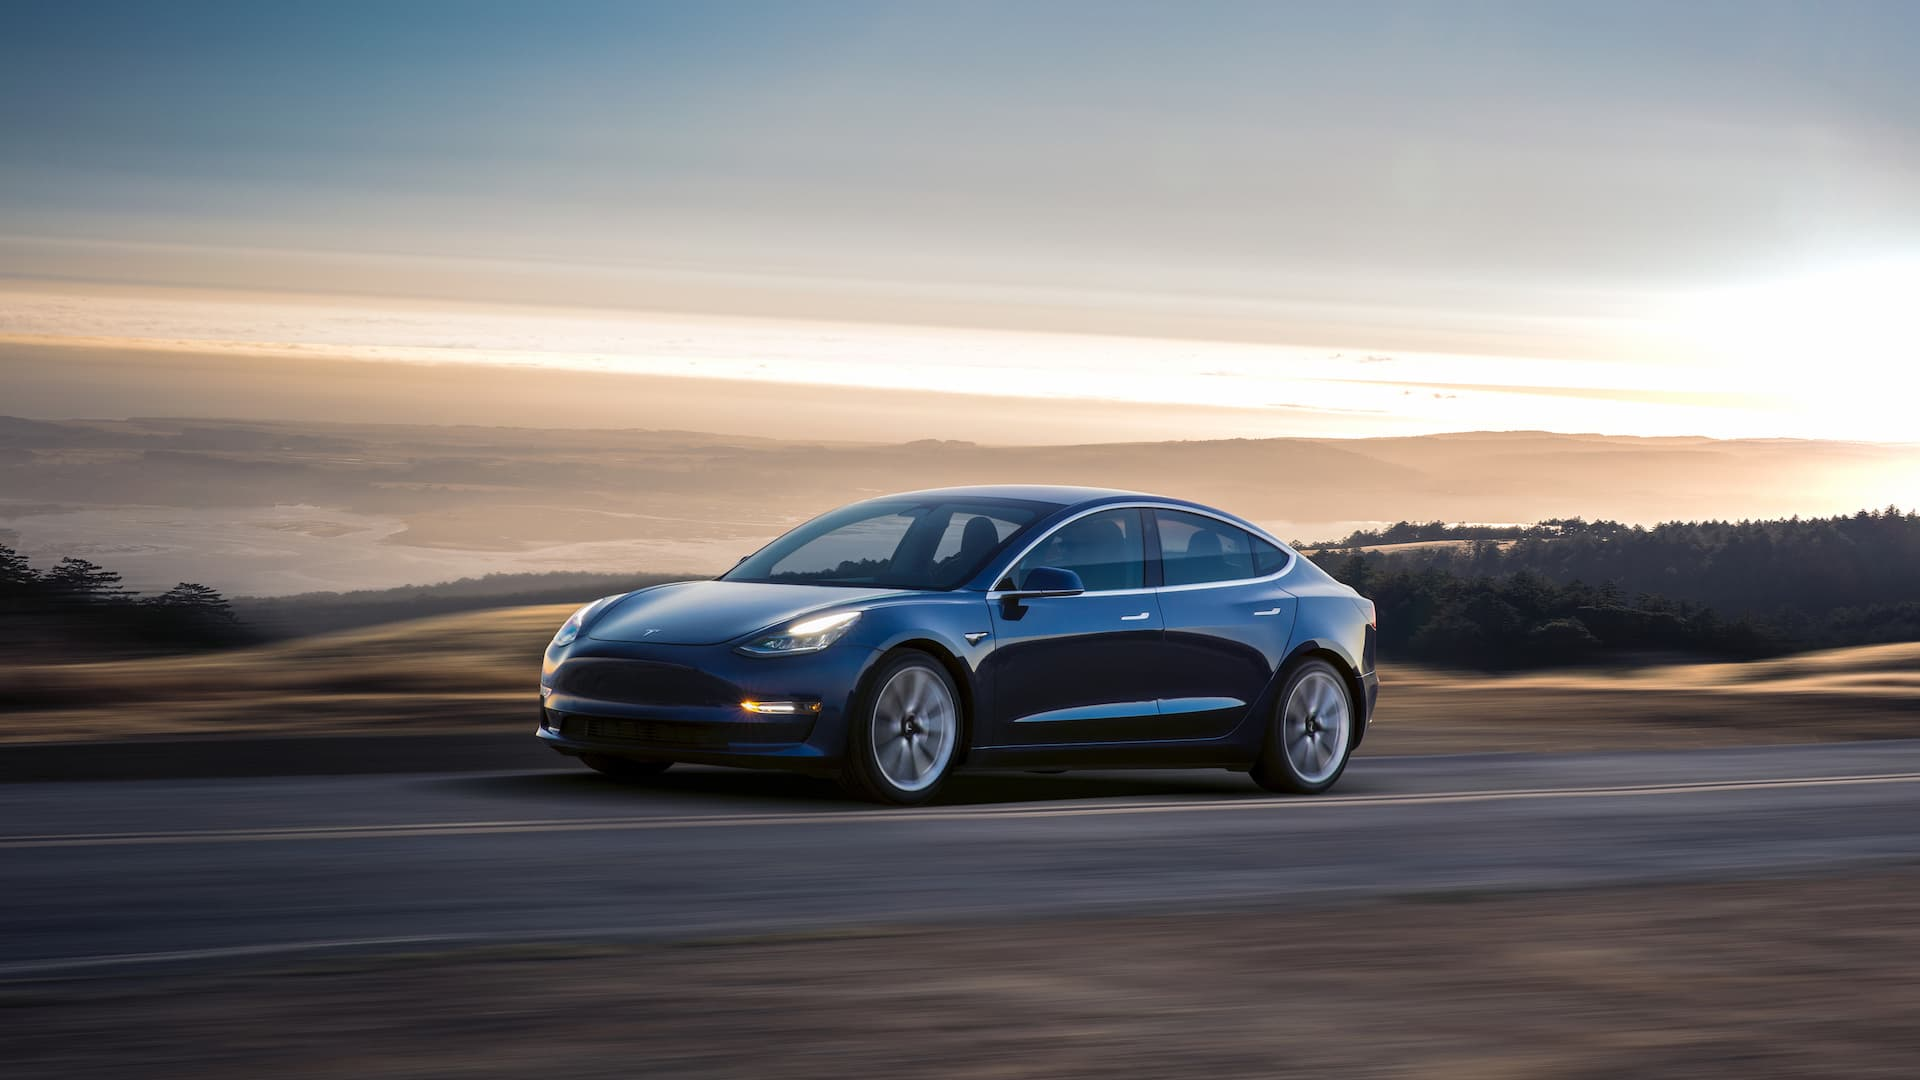 America's best-selling luxury cars